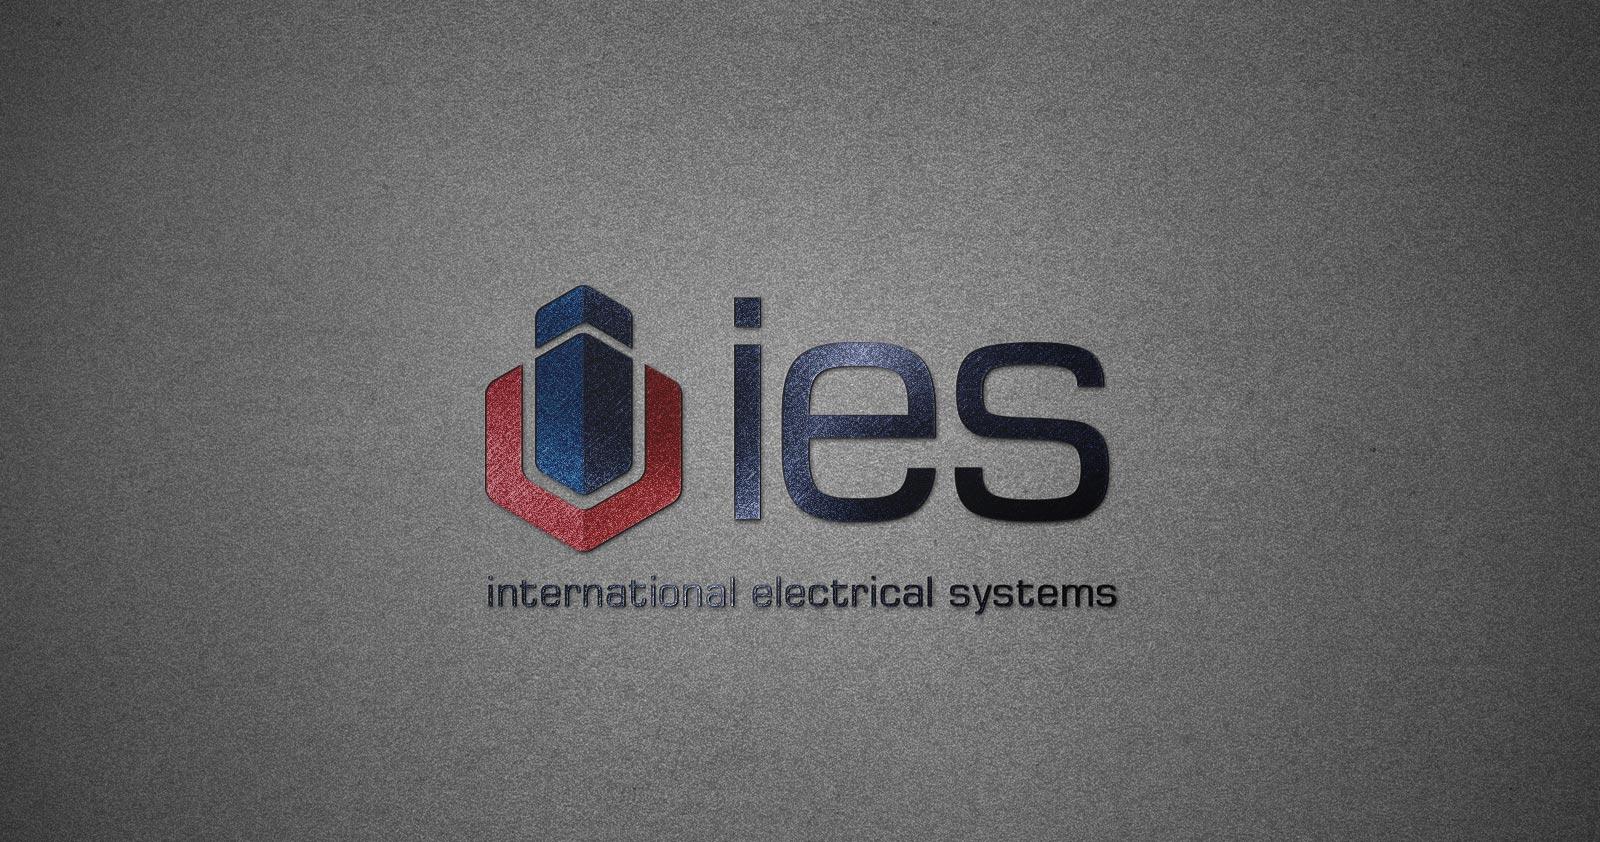 ies logo kurumsal kimlik tasarımı 02